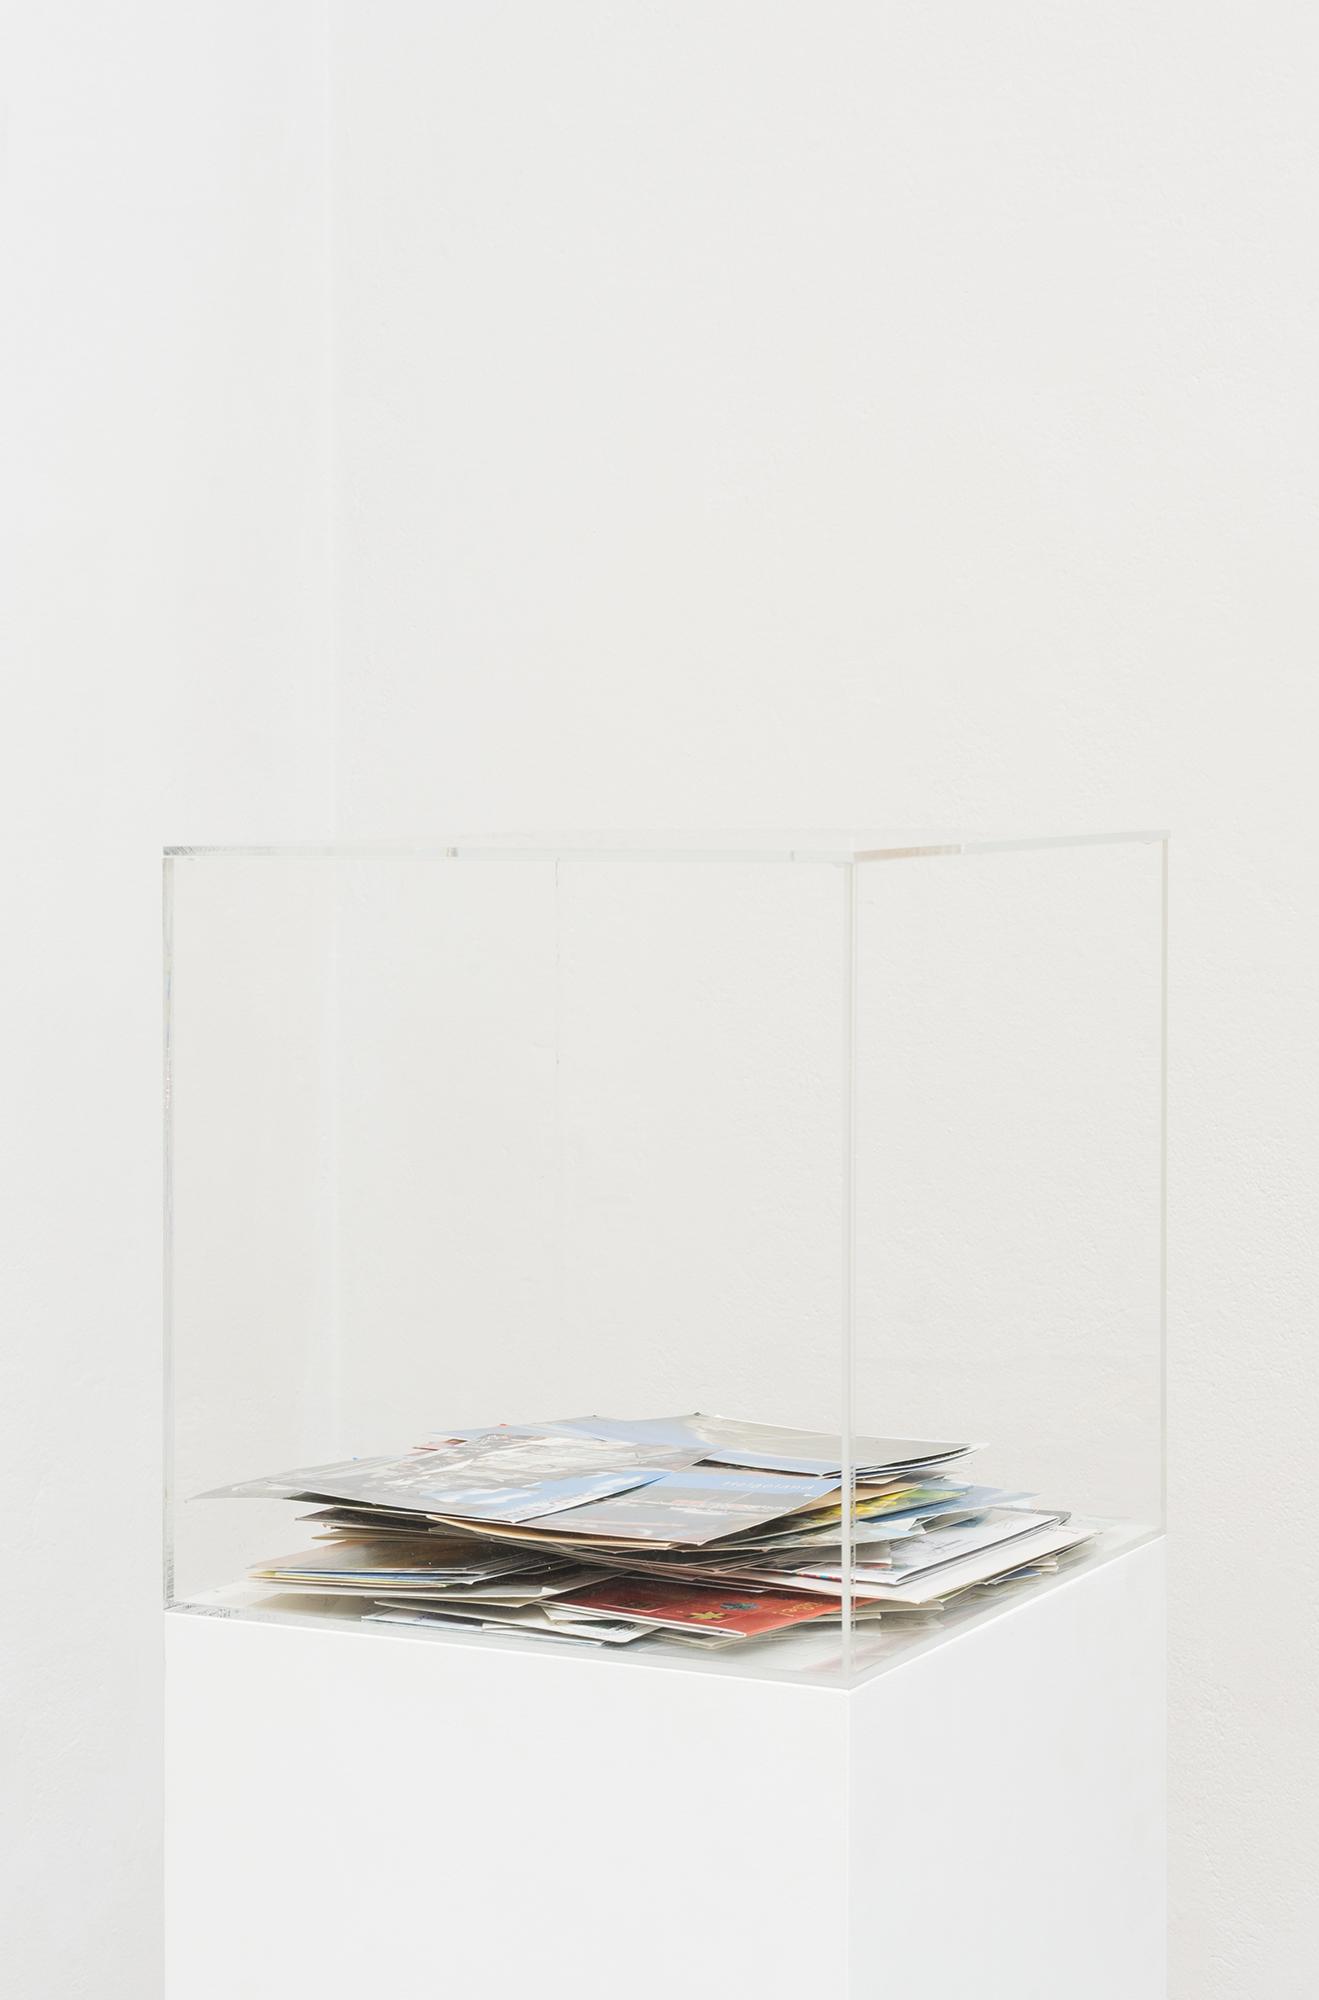 Nicholas Warburg Sie geht auf Reisen usw. 2019 ff. 30 x 30 x 30 cm  Acrylic box with incoming postcards Photo by Sascha Herrmann